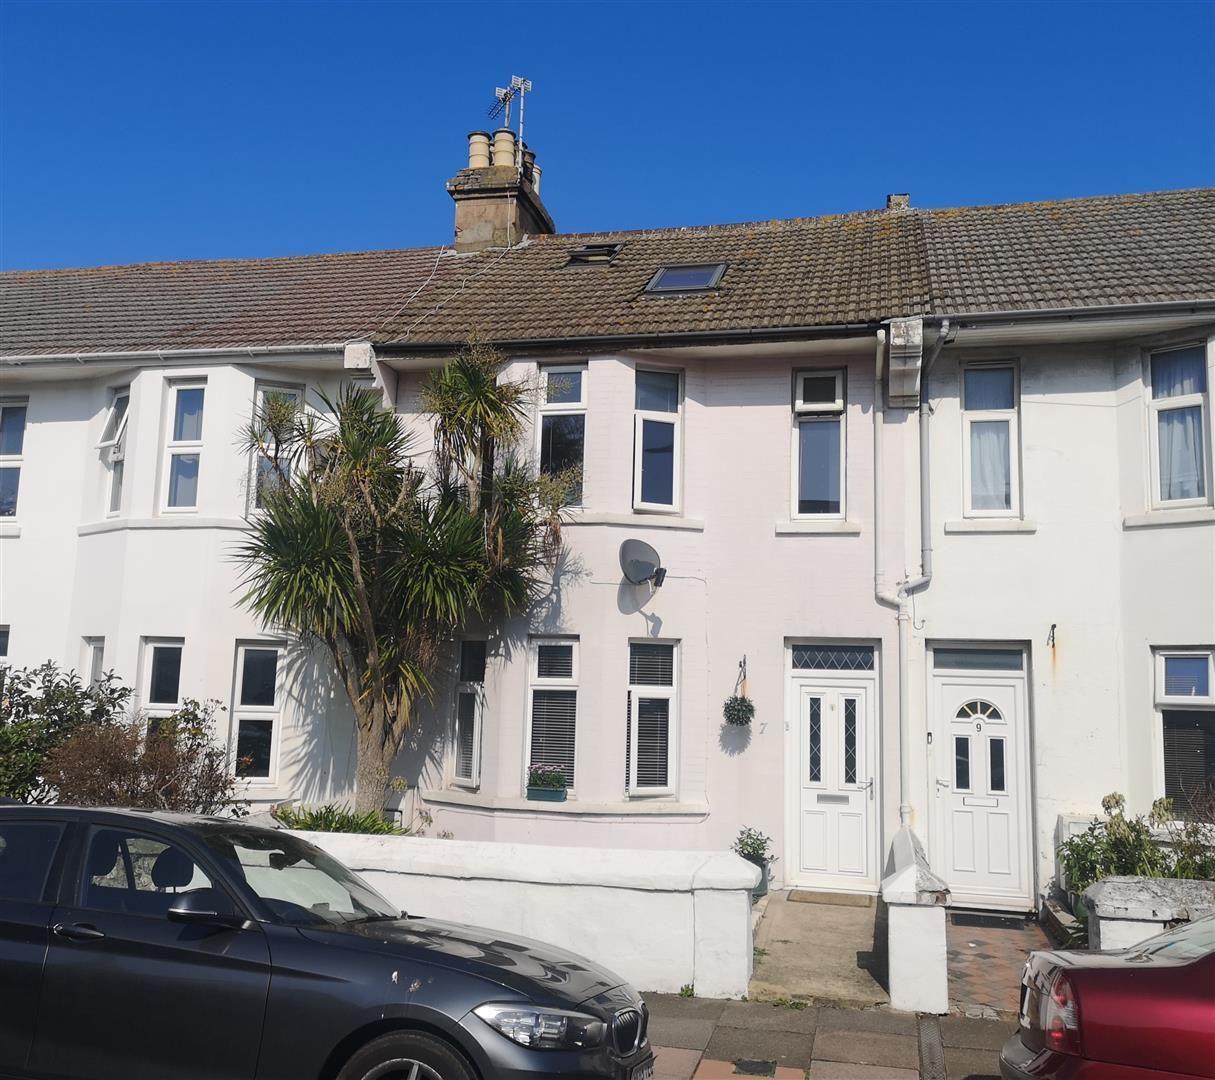 Property photo 1 of 14. Img_20200921_133443.Jpg